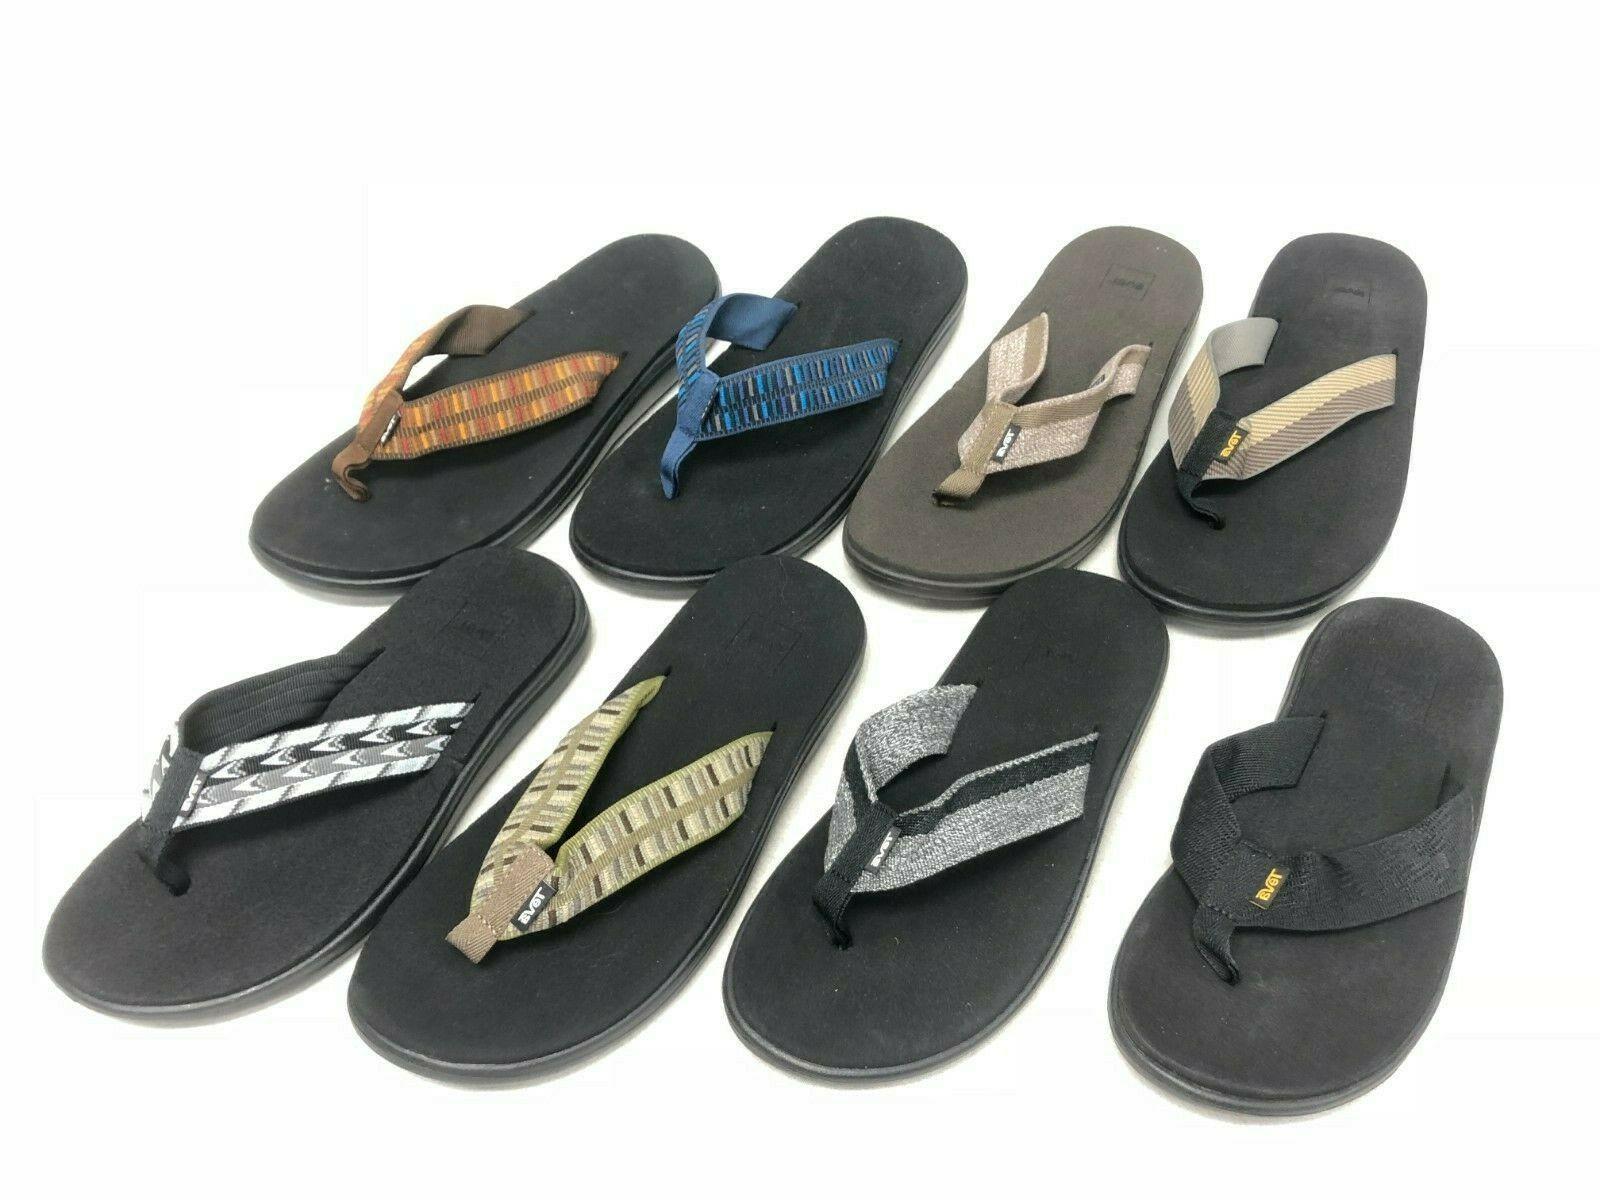 Teva Men's Flip Flops Sandals Mush Multiple Colors